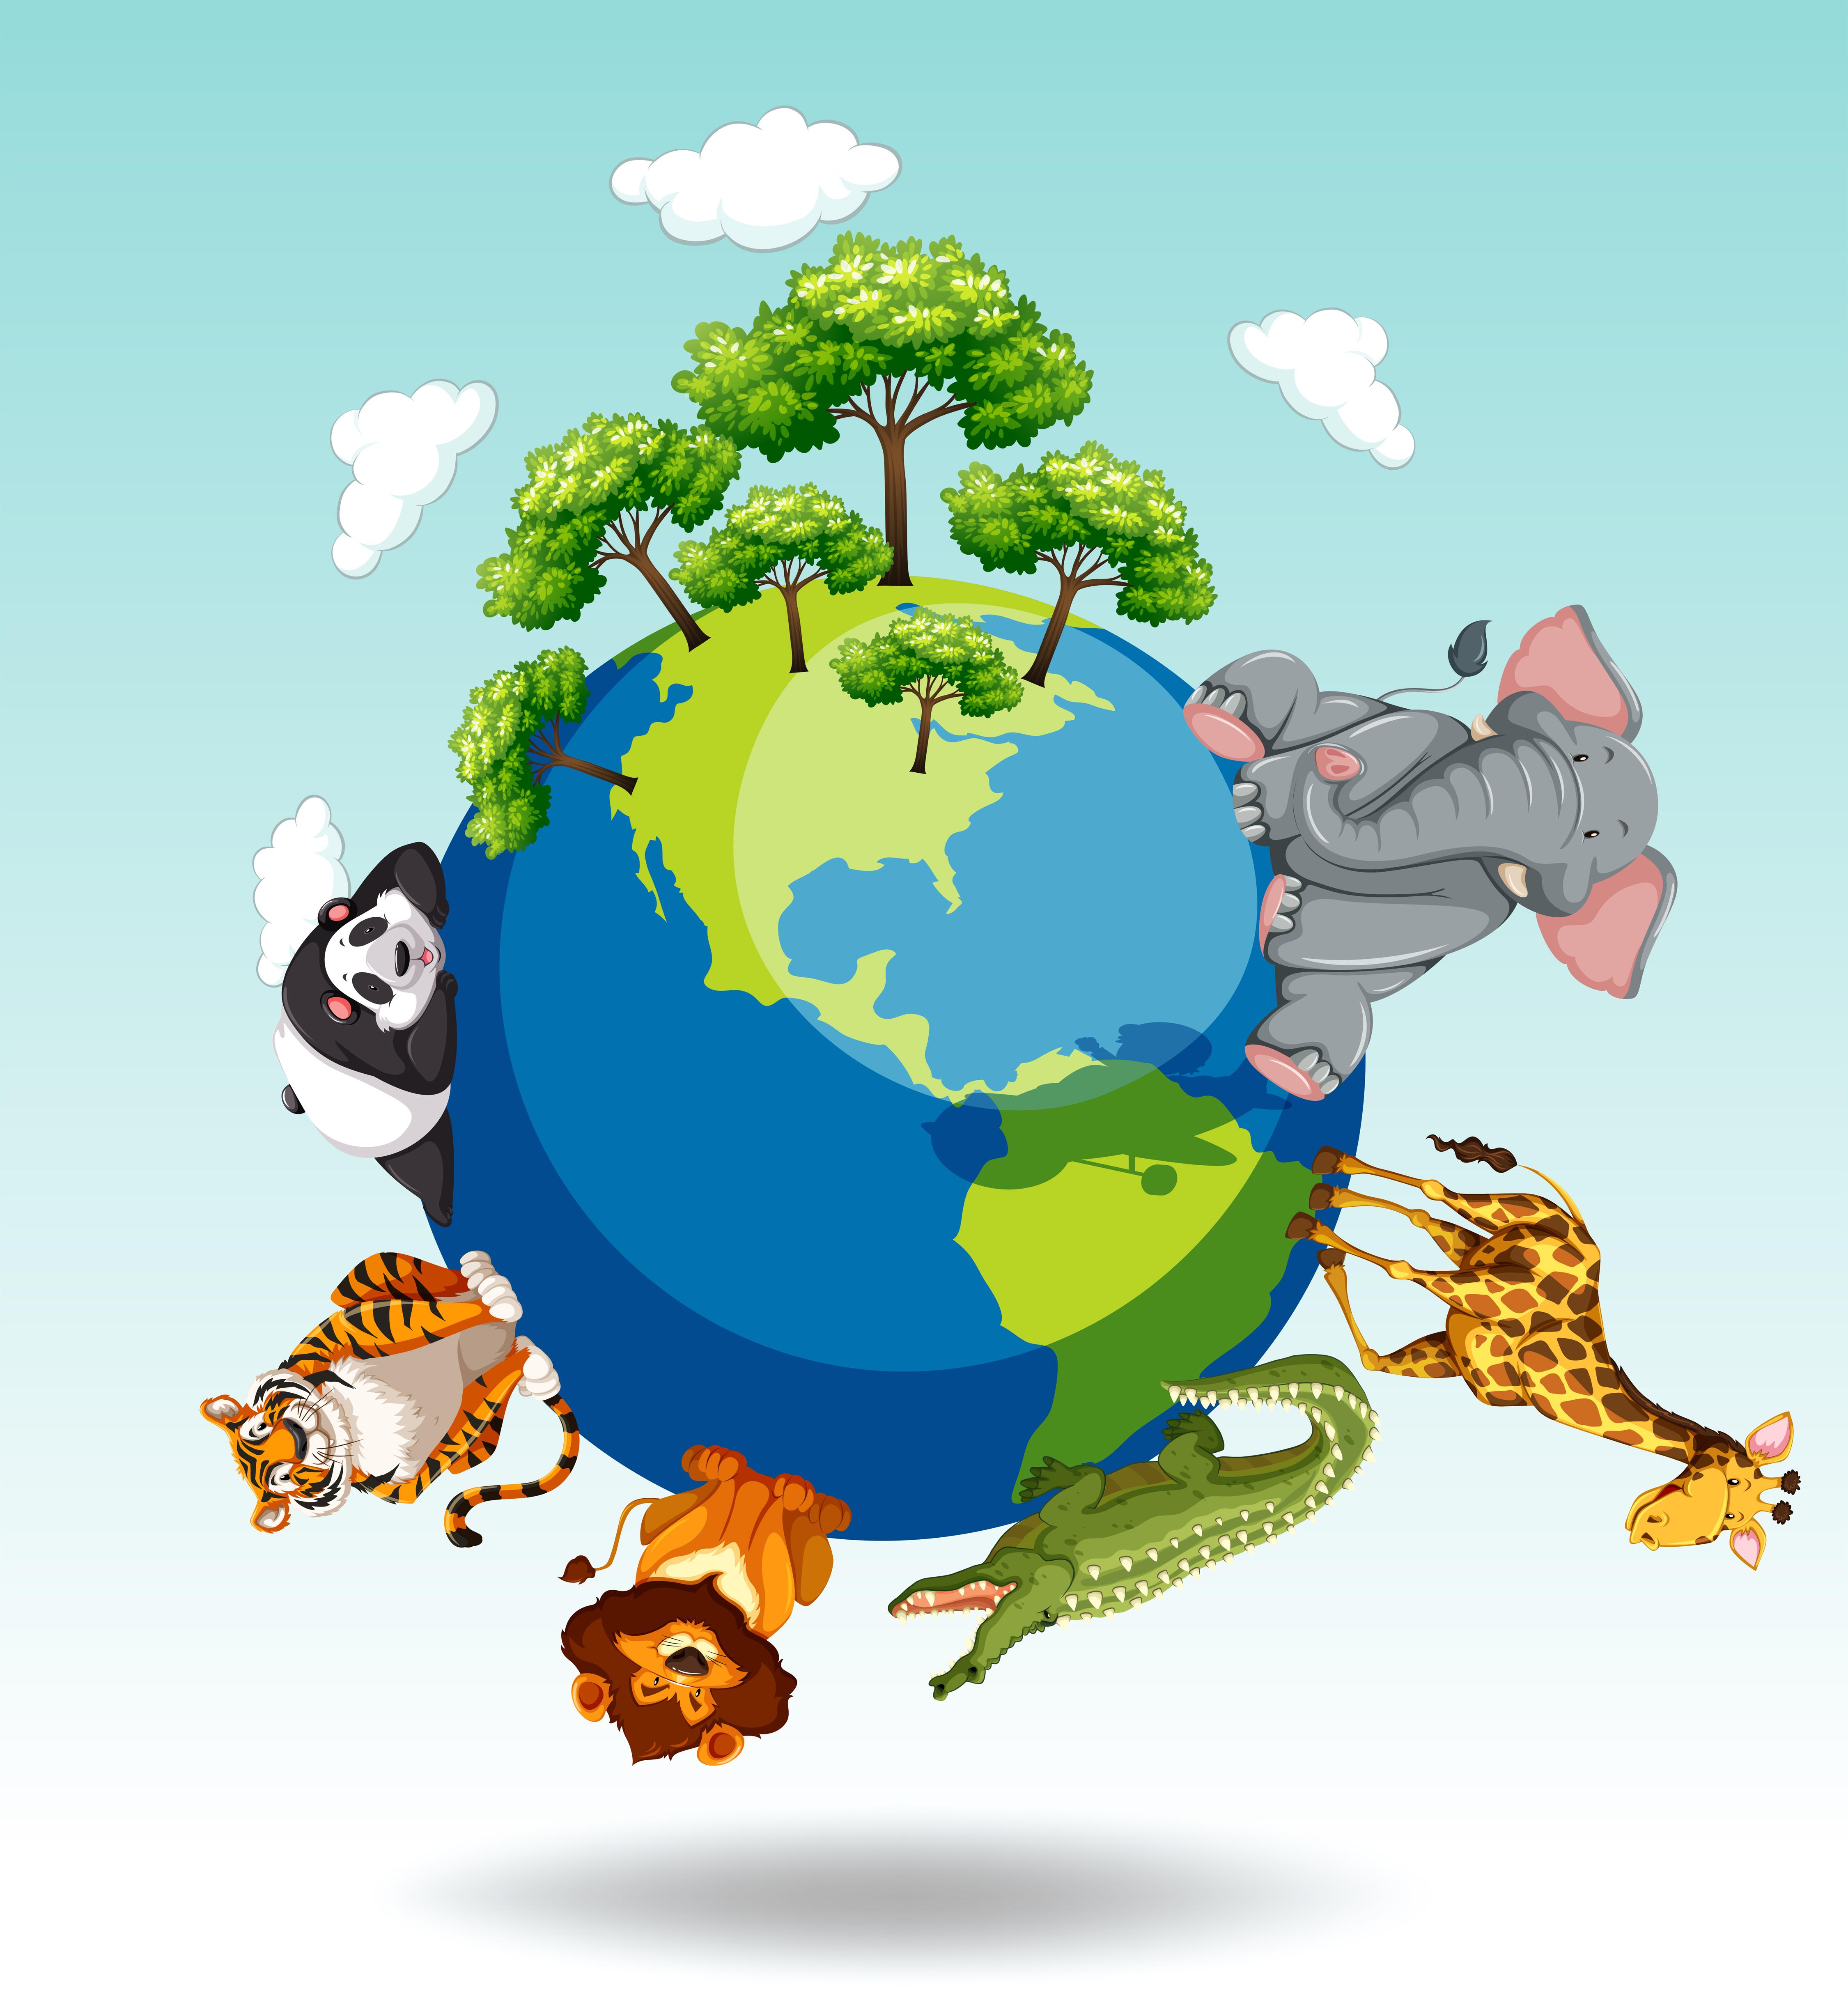 Wild Animals Around The World 447122 Vector Art At Vecteezy